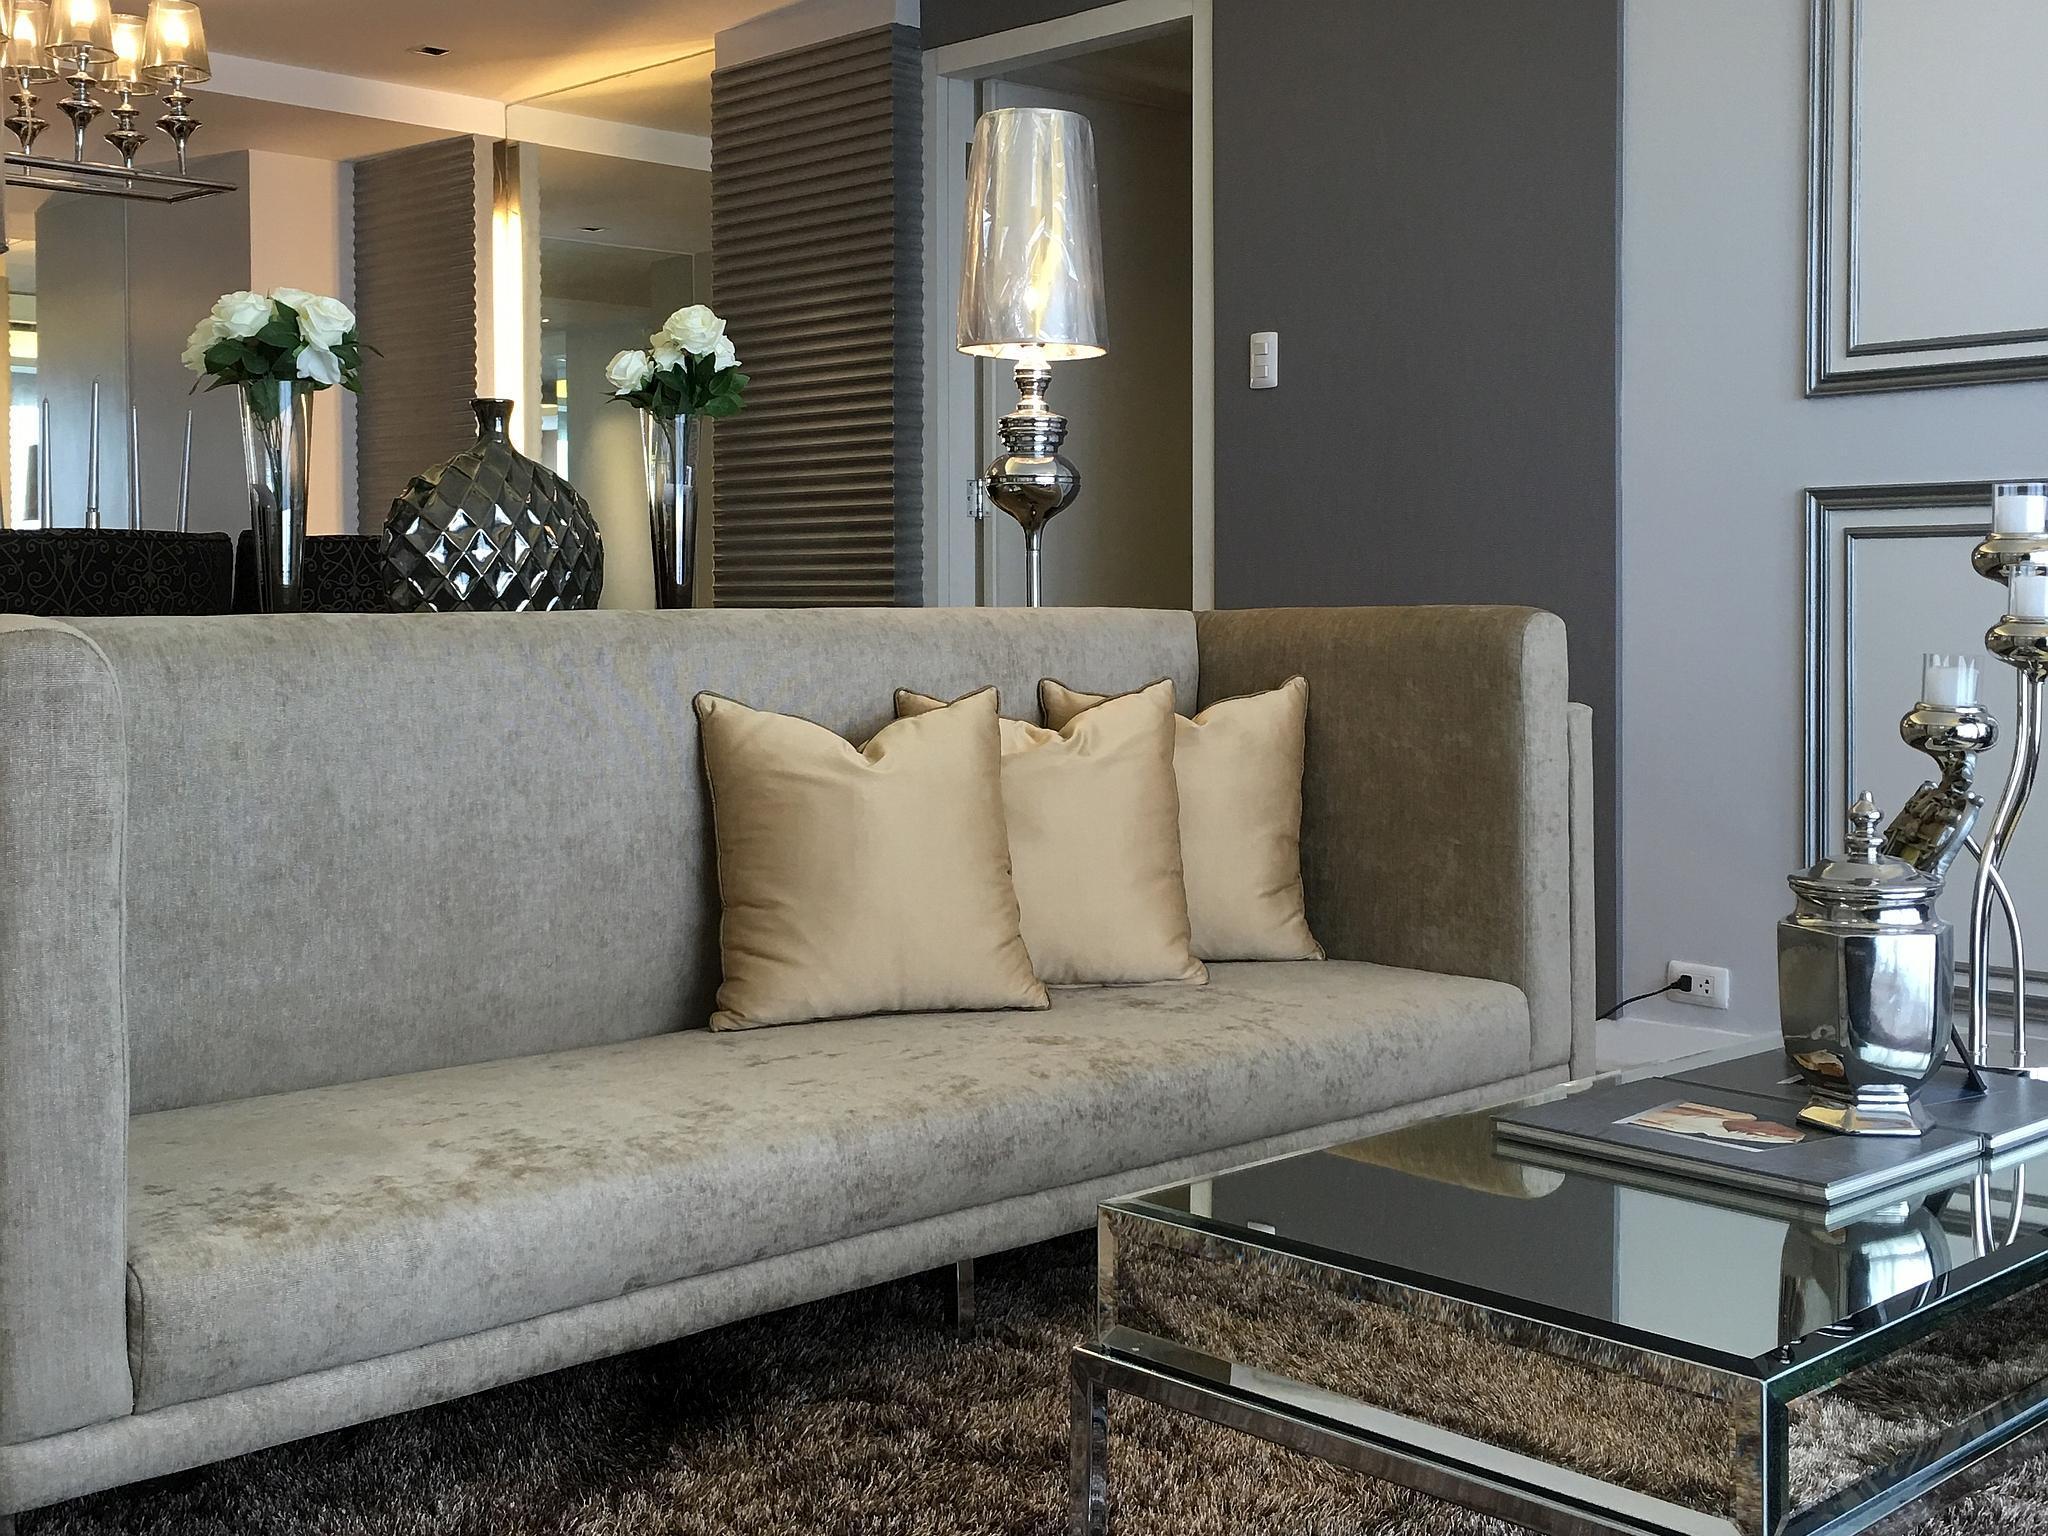 Shang Luxury Suites 2BR near One Shangri-la Mall, Mandaluyong